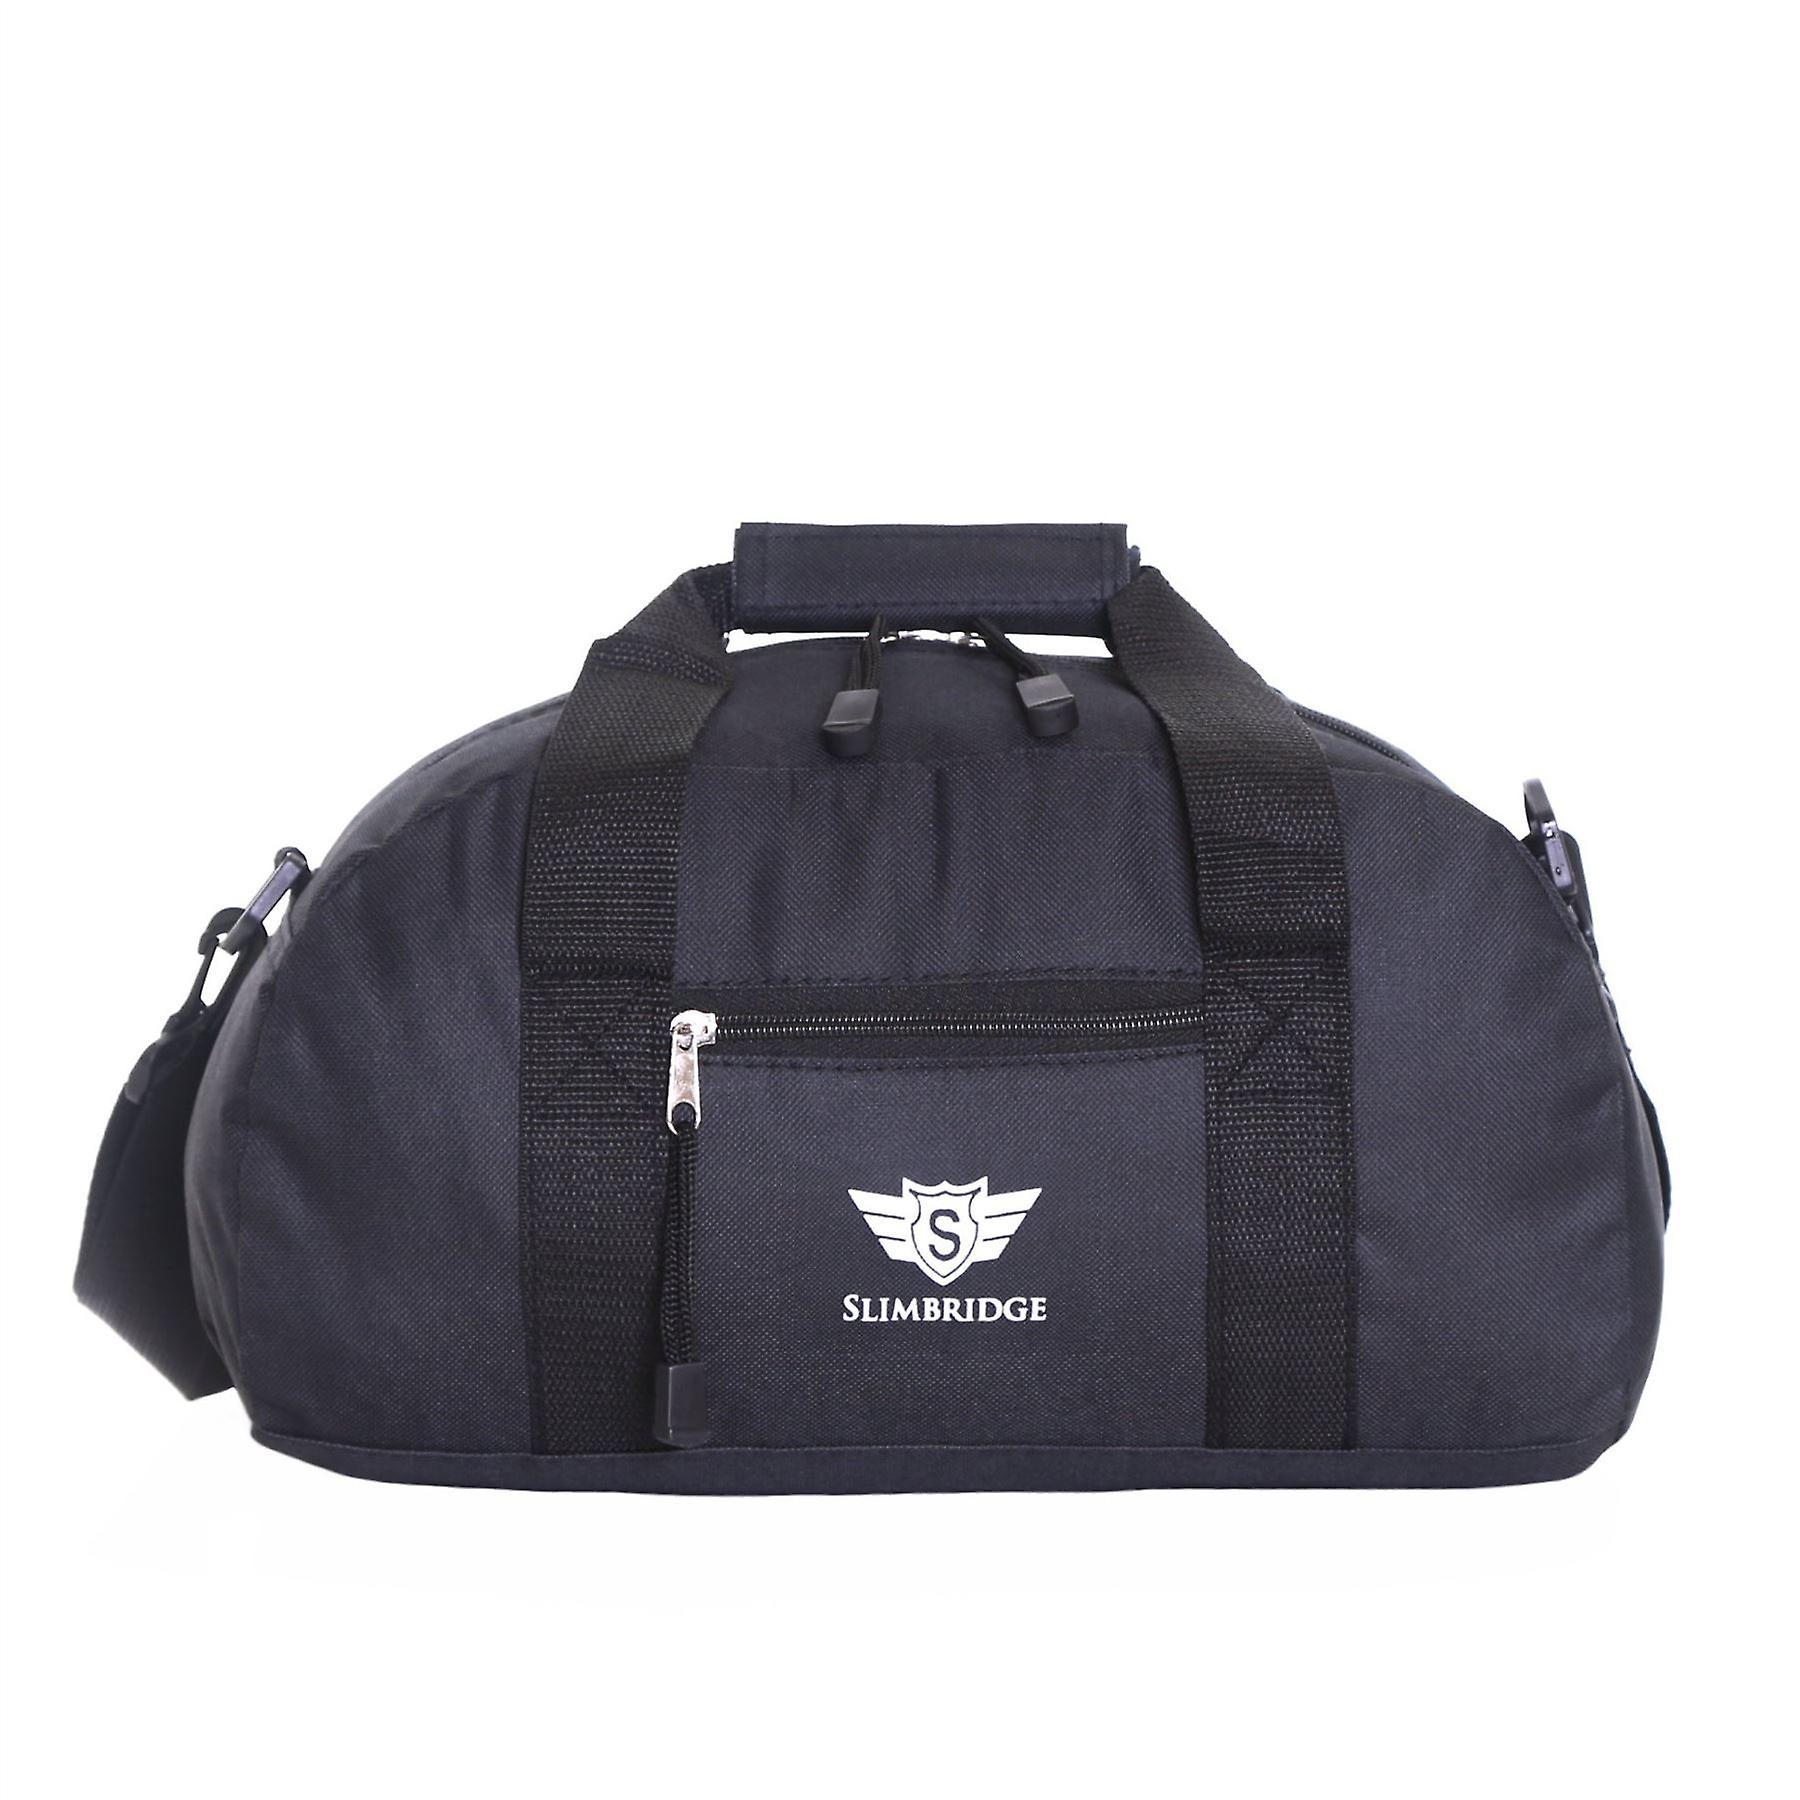 Slimbridge Elgin Small Ryanair Cabin Bag, Black